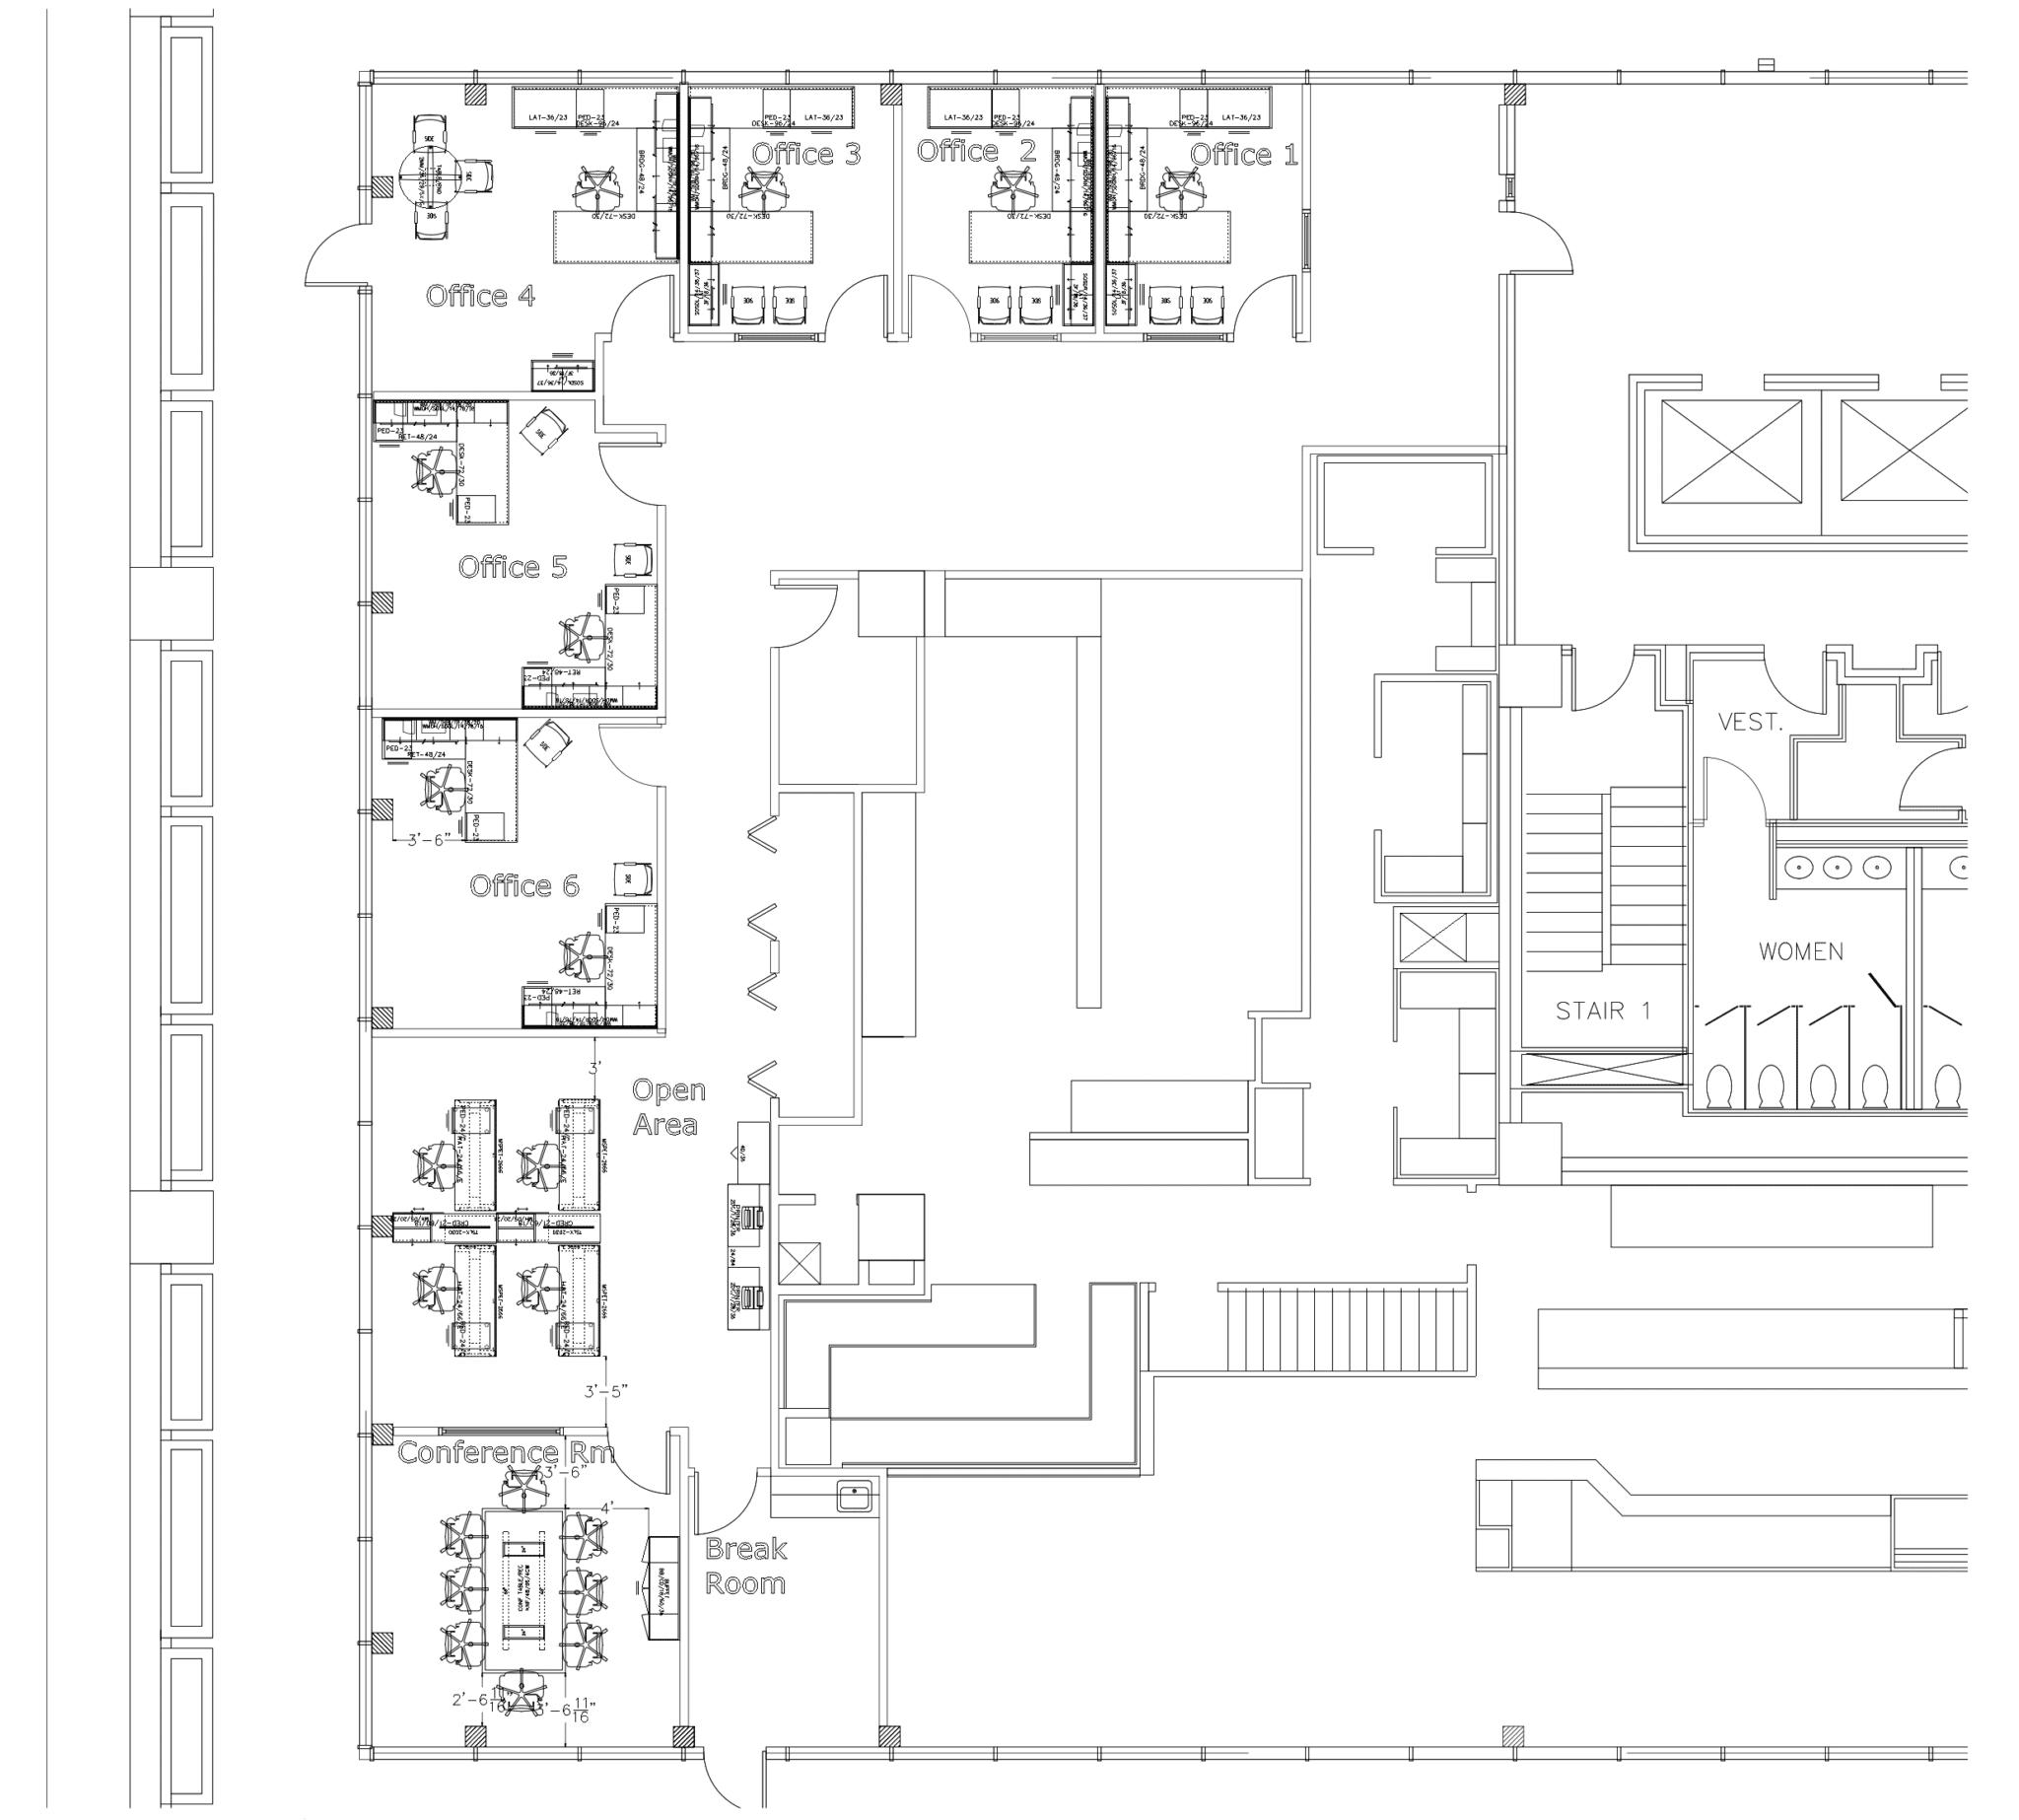 BT360 CAD drawing sample